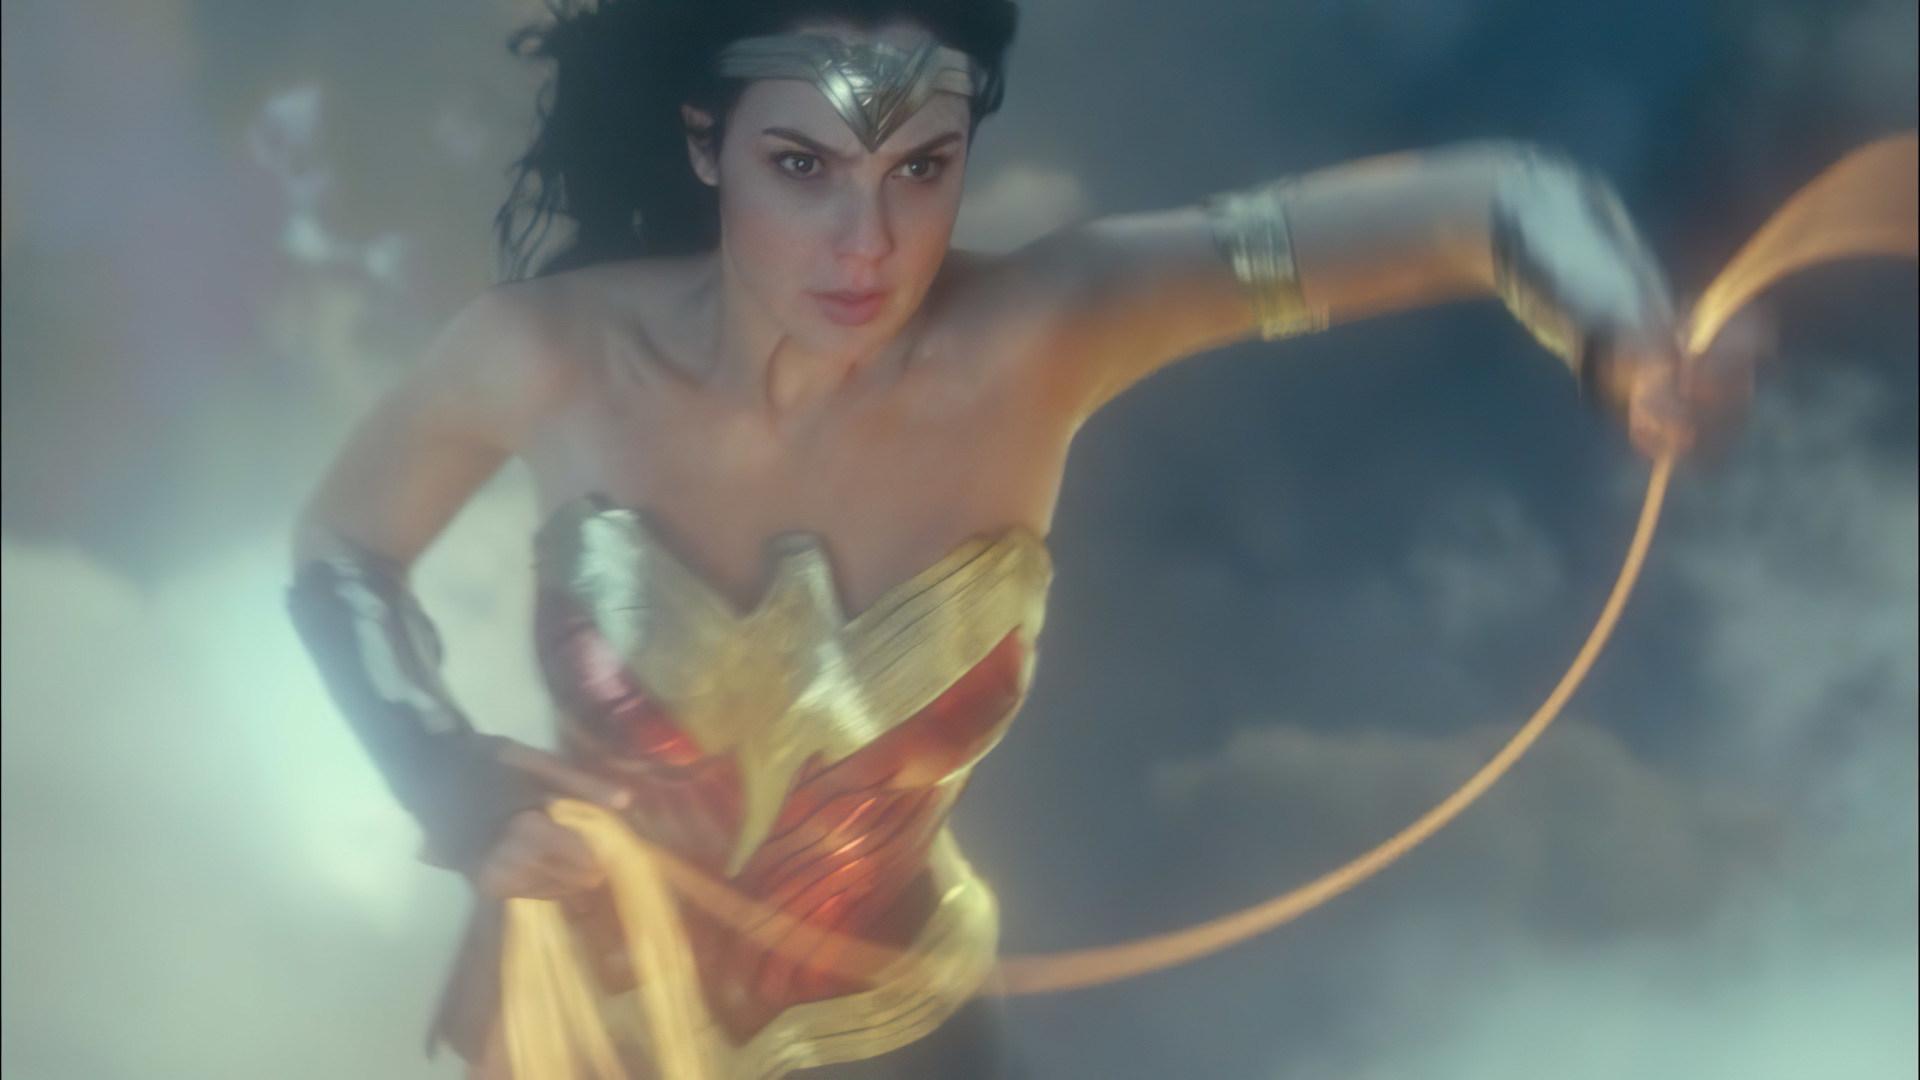 Trailer, Kino, Kinofilm, Warner Bros., DC Comics, DC, Wonder Woman, Wonder Woman 1984